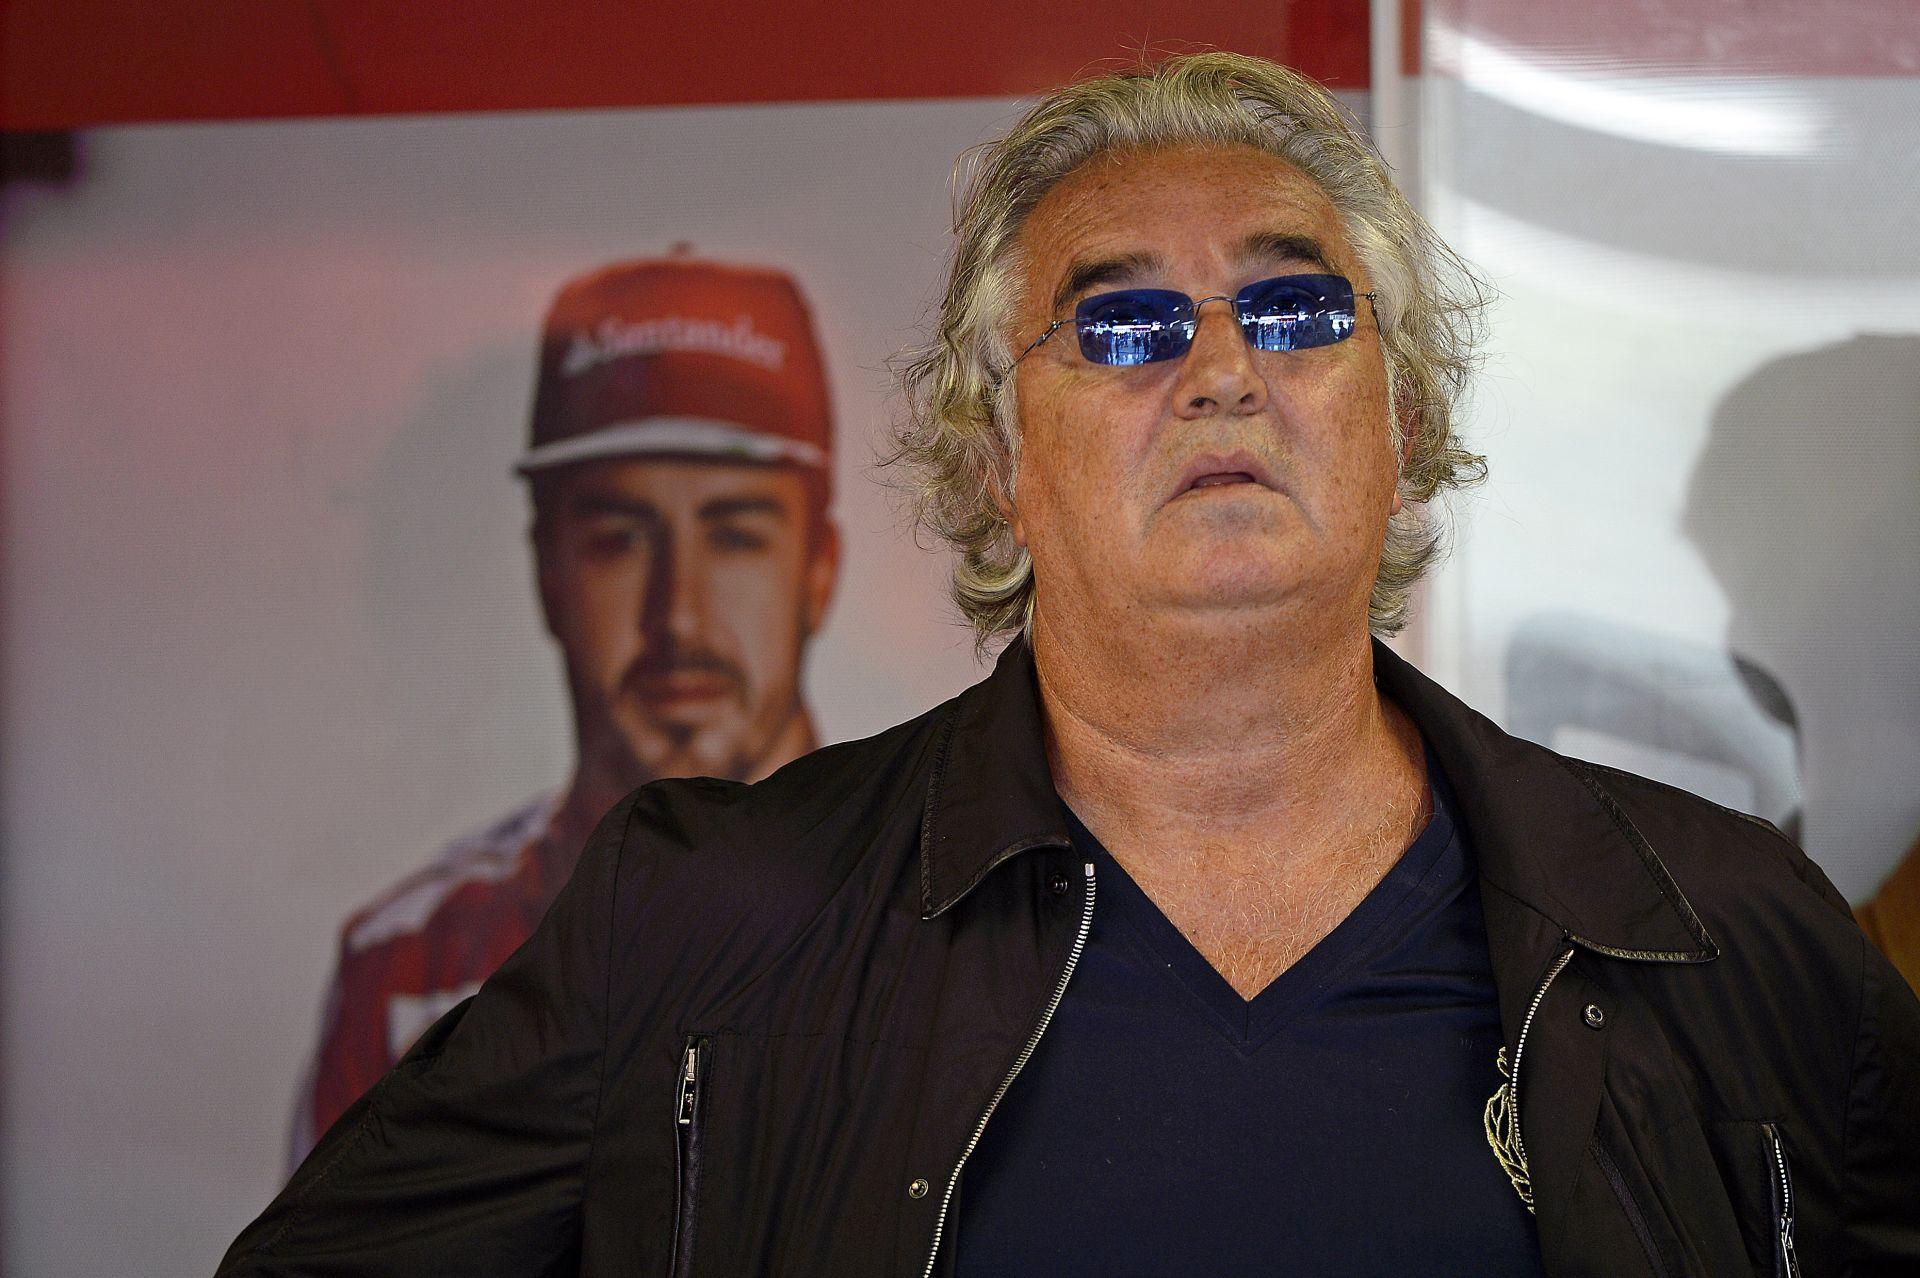 Ki lehetne Domenicali utódja a Ferrarinál? Briatore, Brawn, Whitmarsh?